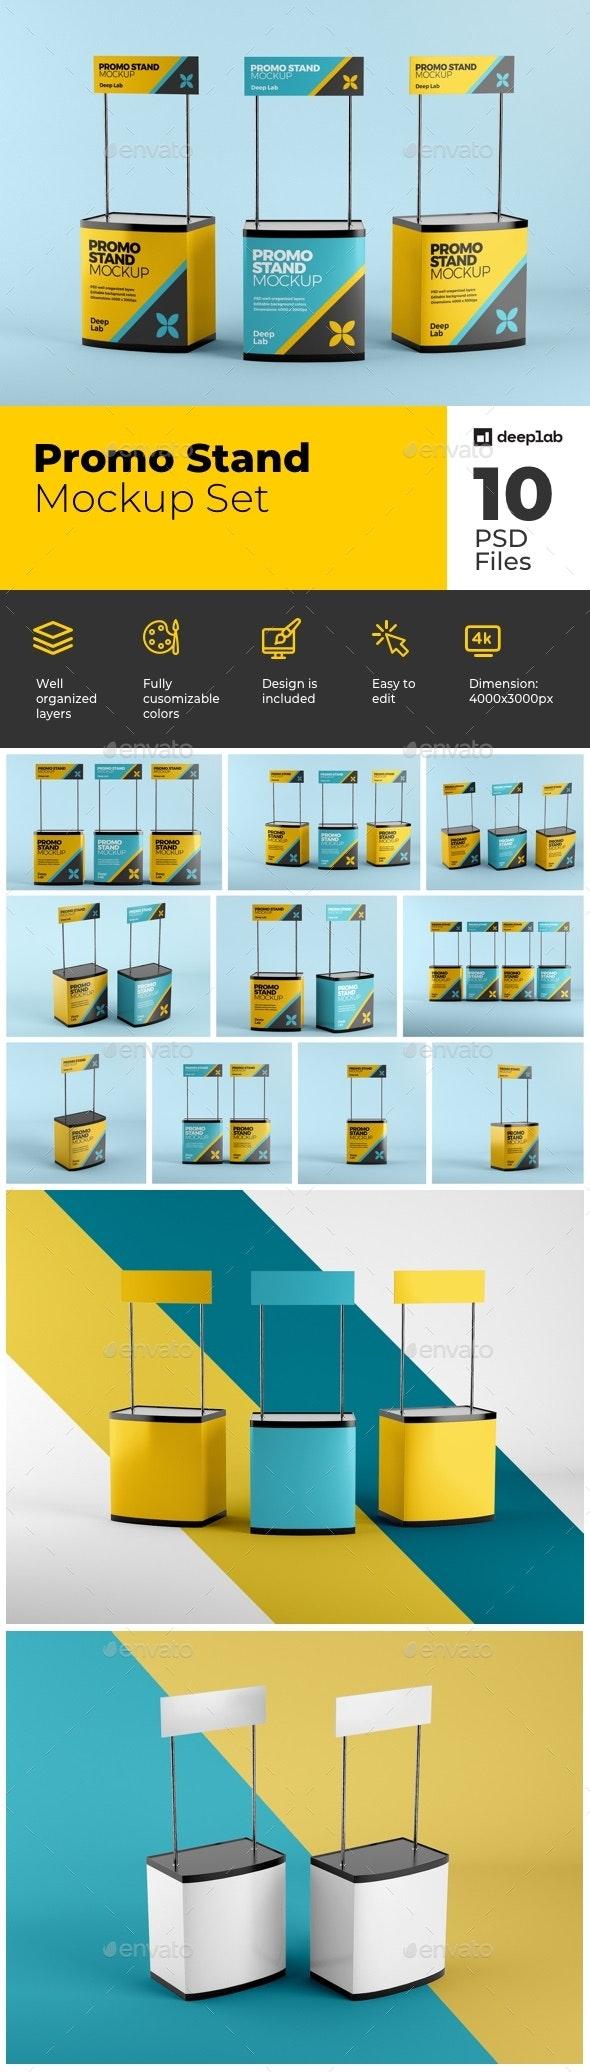 Promo Stand Mockup Set - Product Mock-Ups Graphics